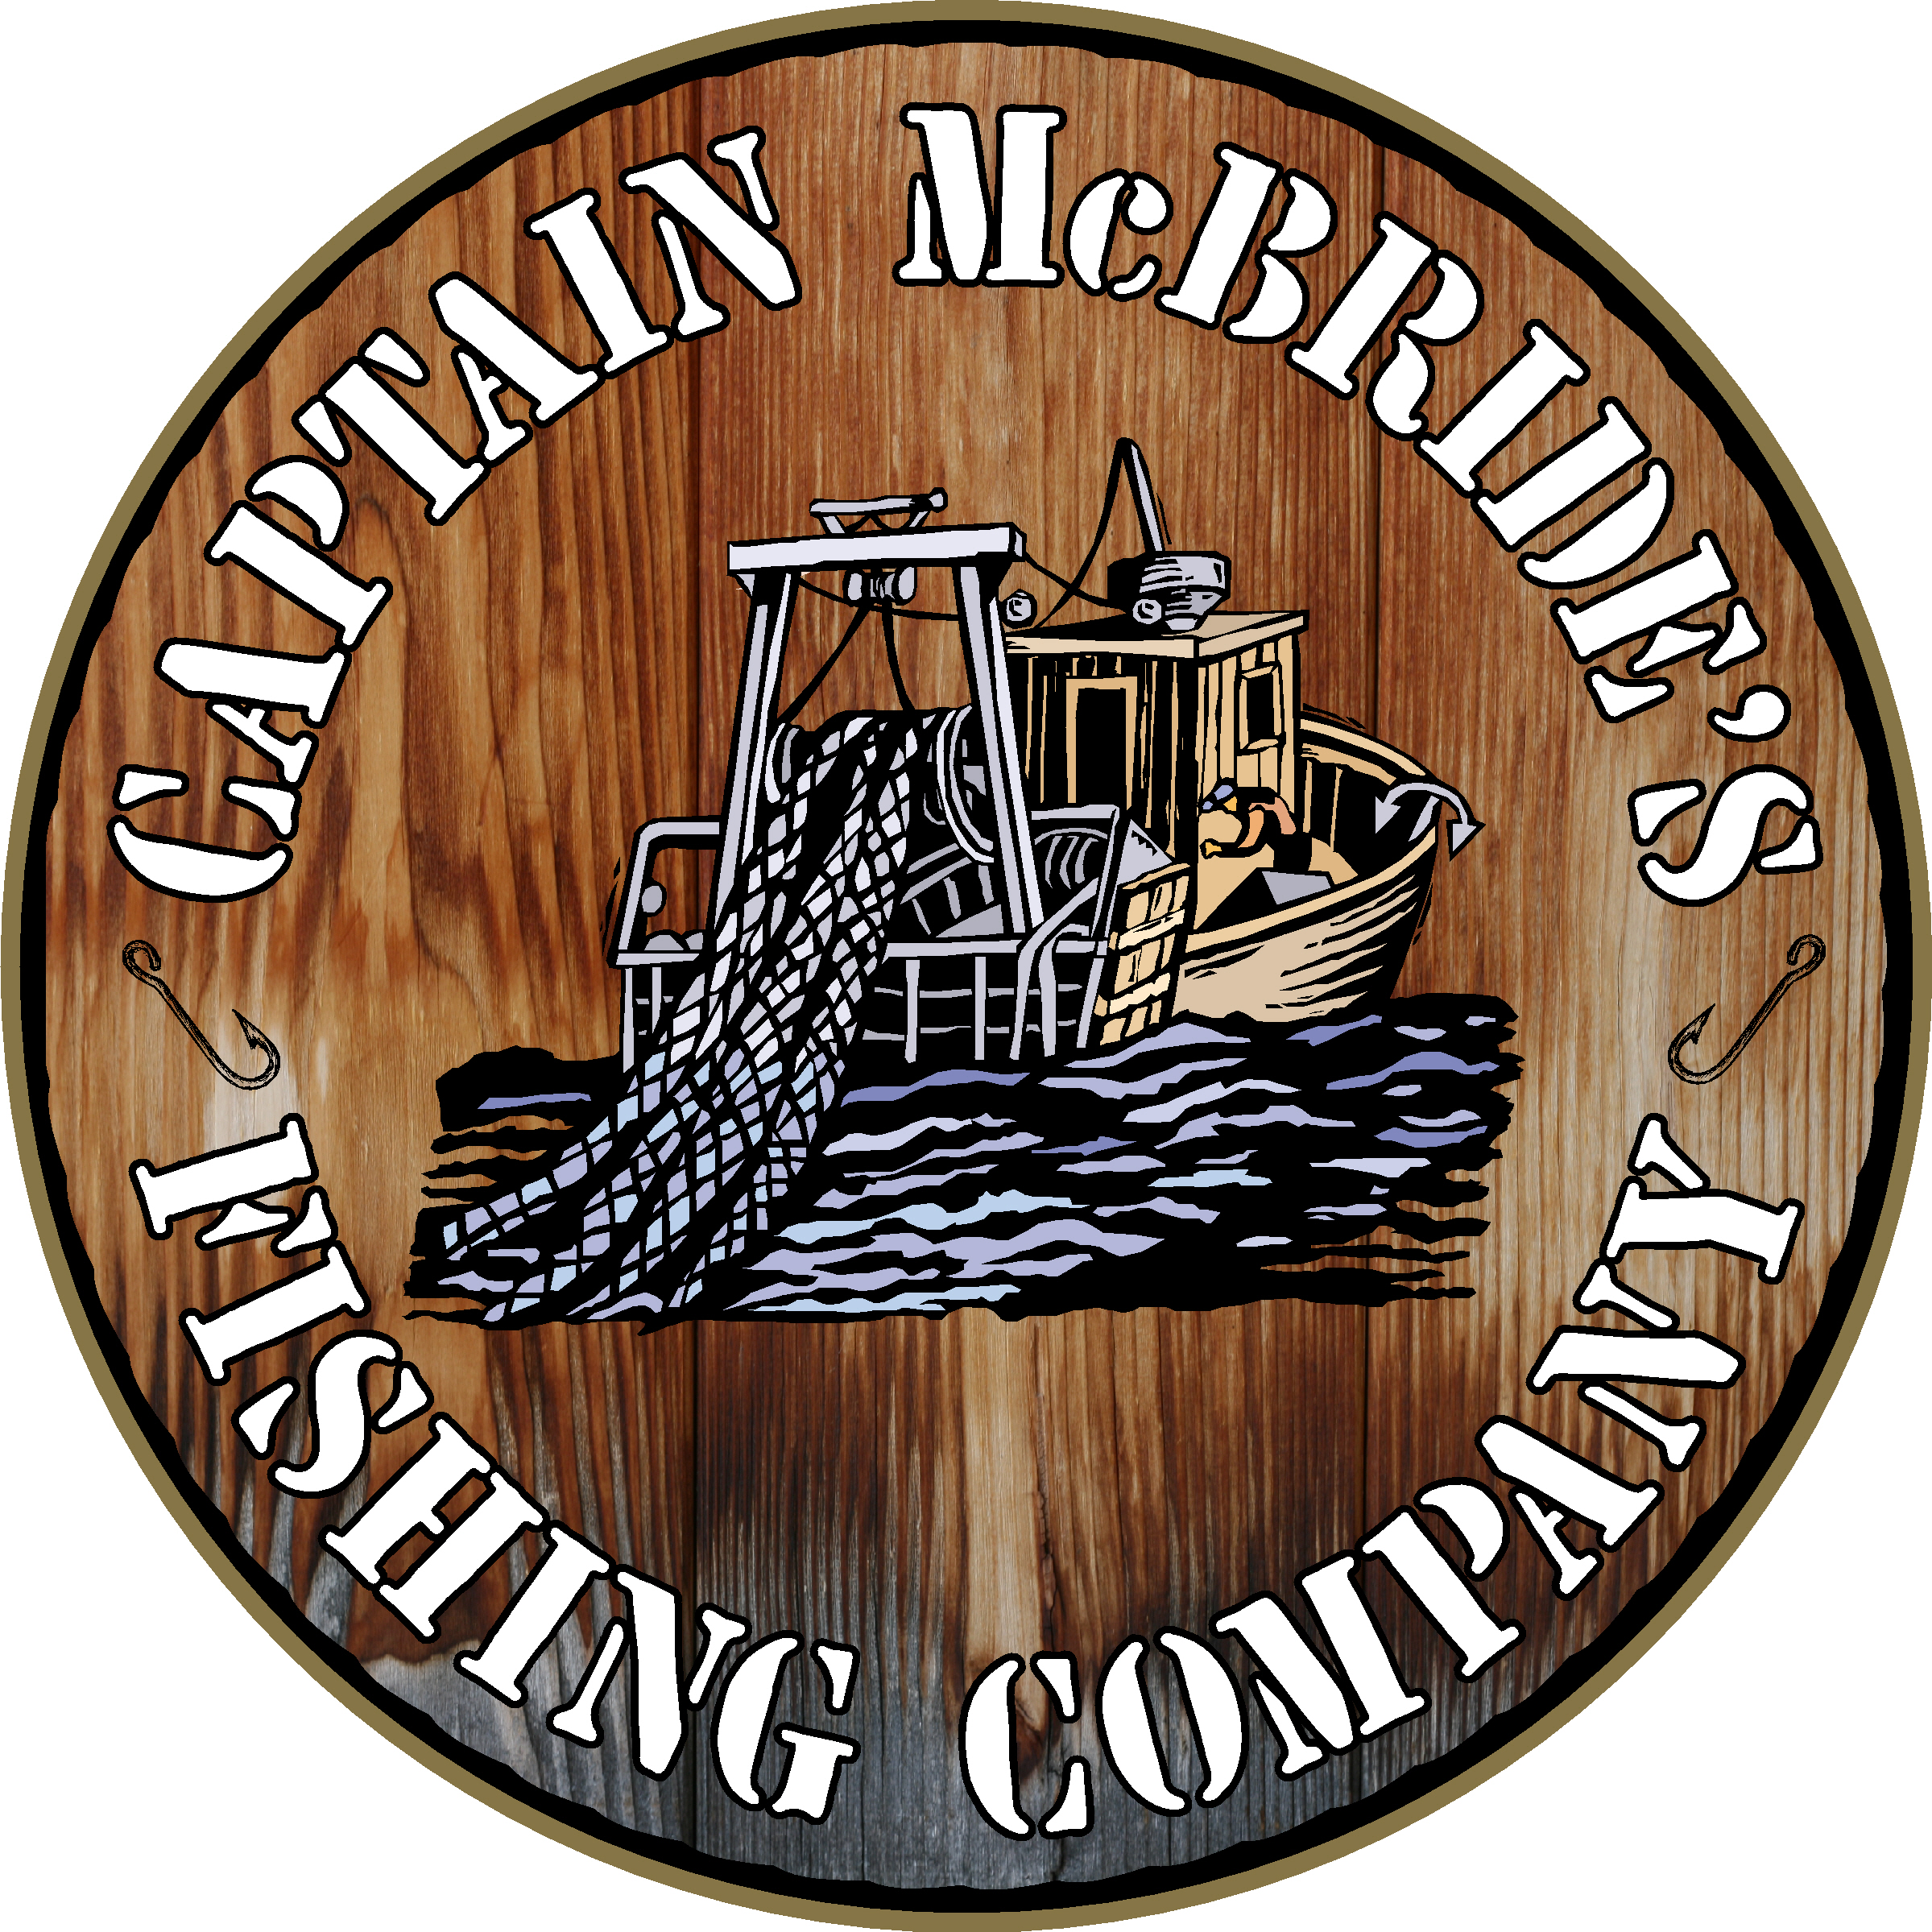 captain Mcbride.jpg